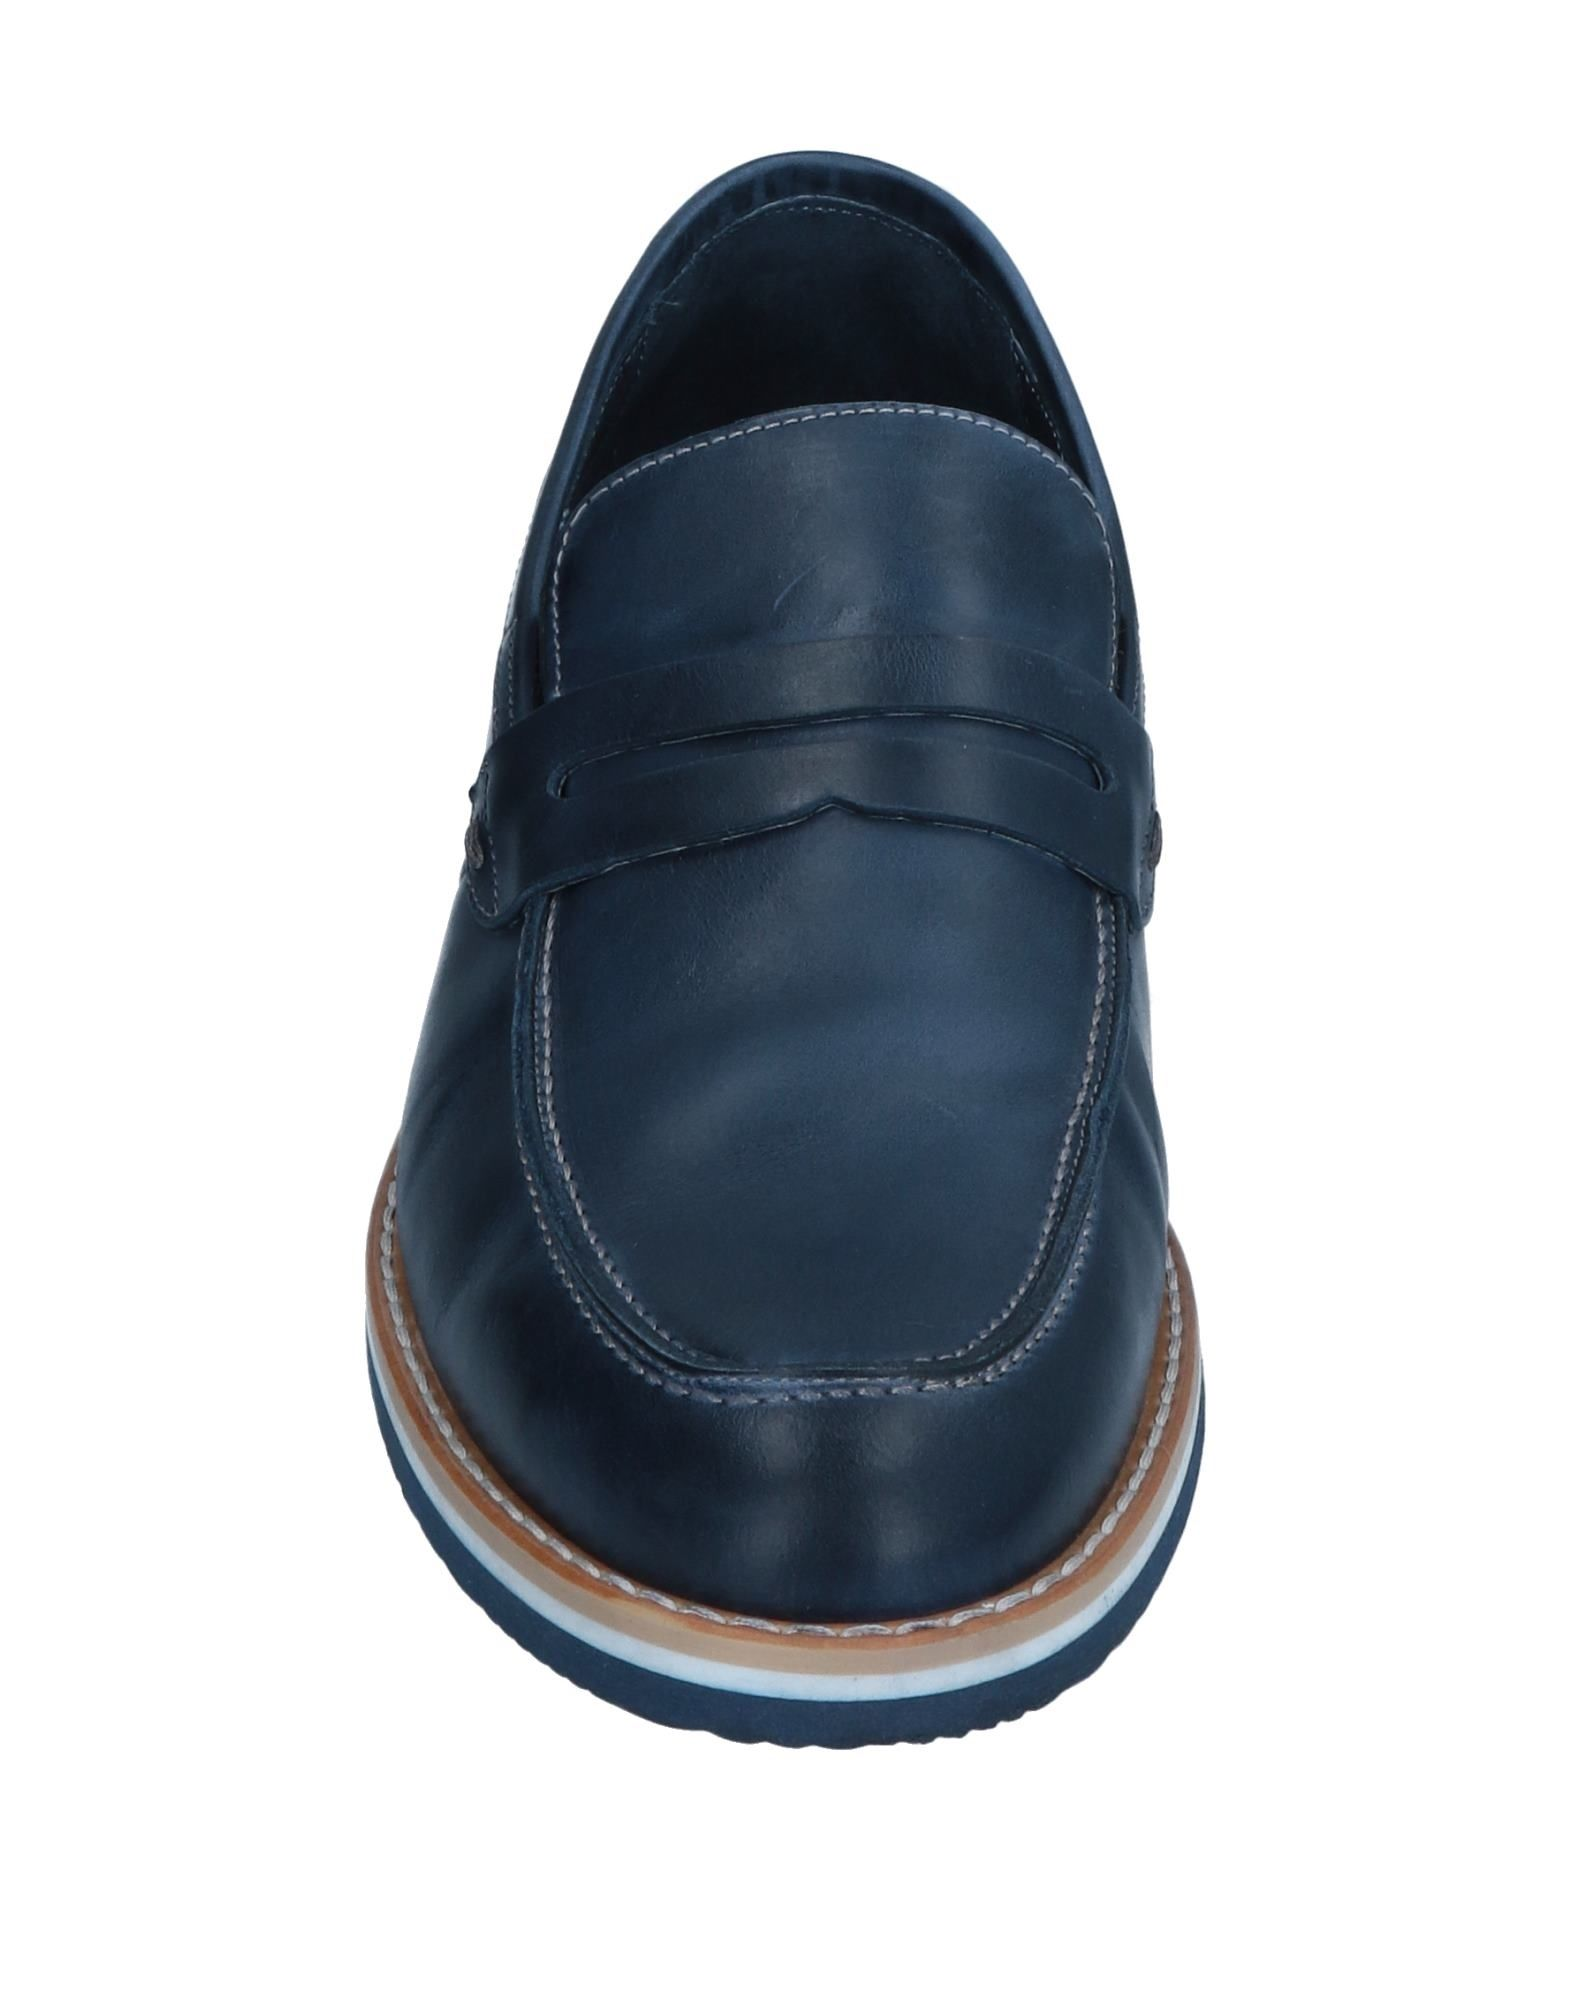 Cristiano Rossani® Gute Mokassins Herren  11557690LP Gute Rossani® Qualität beliebte Schuhe 8b57d9